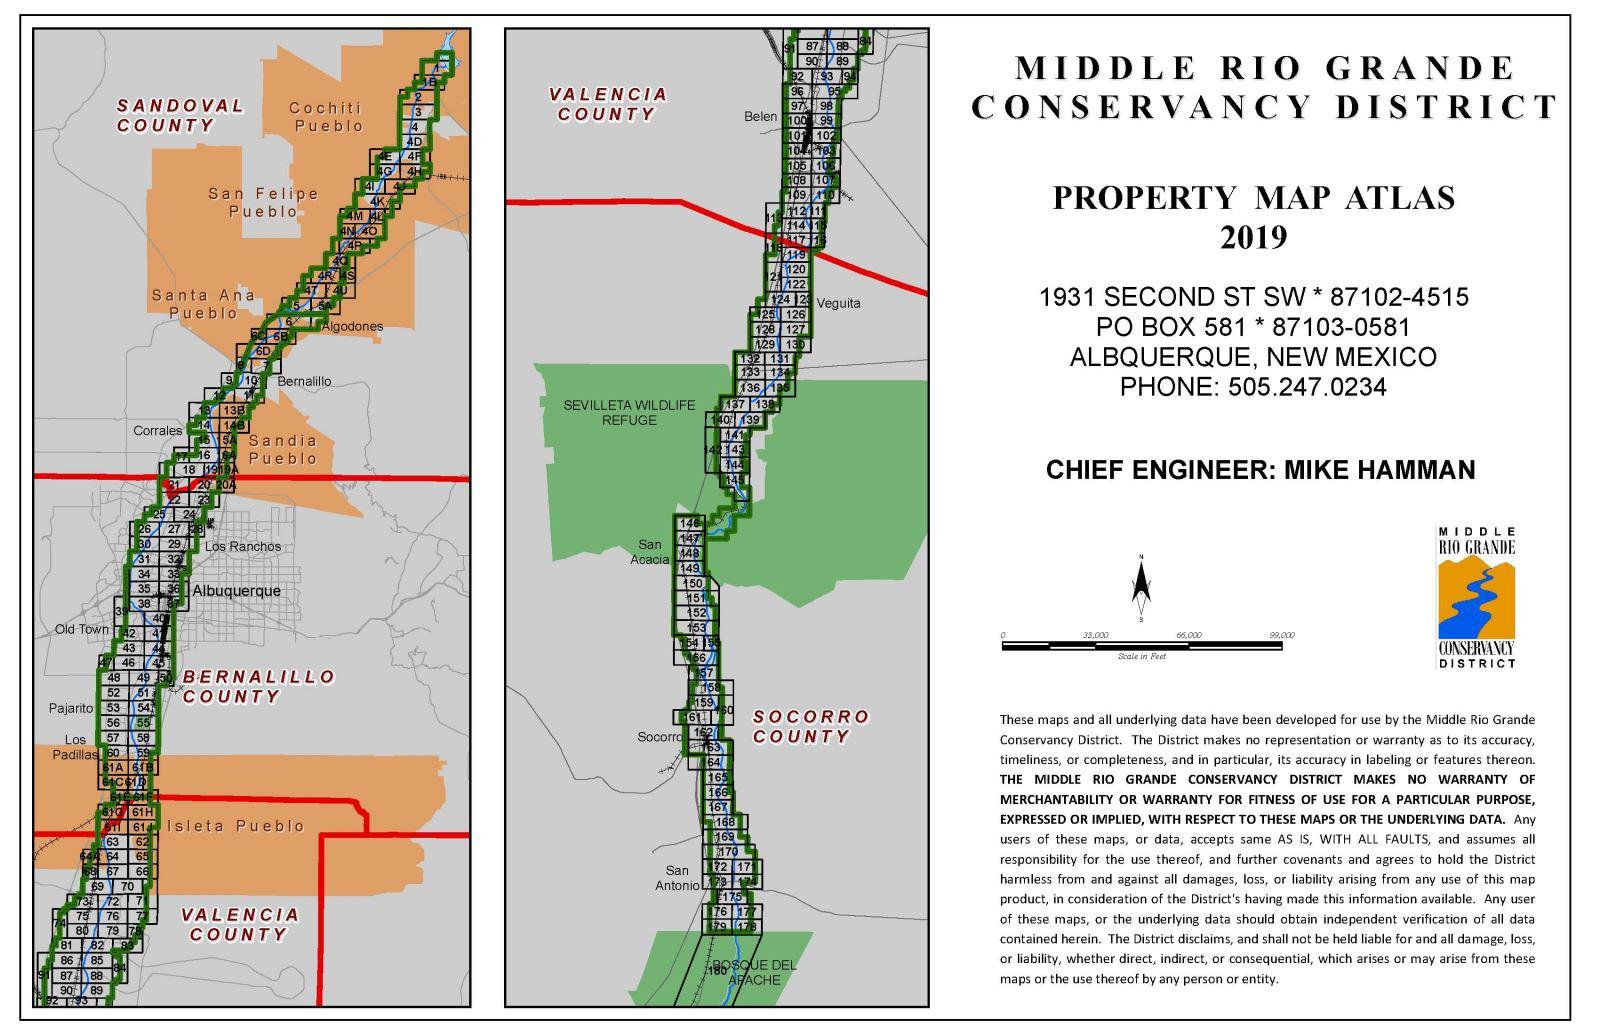 MRGCD Property Map Atlas 2019